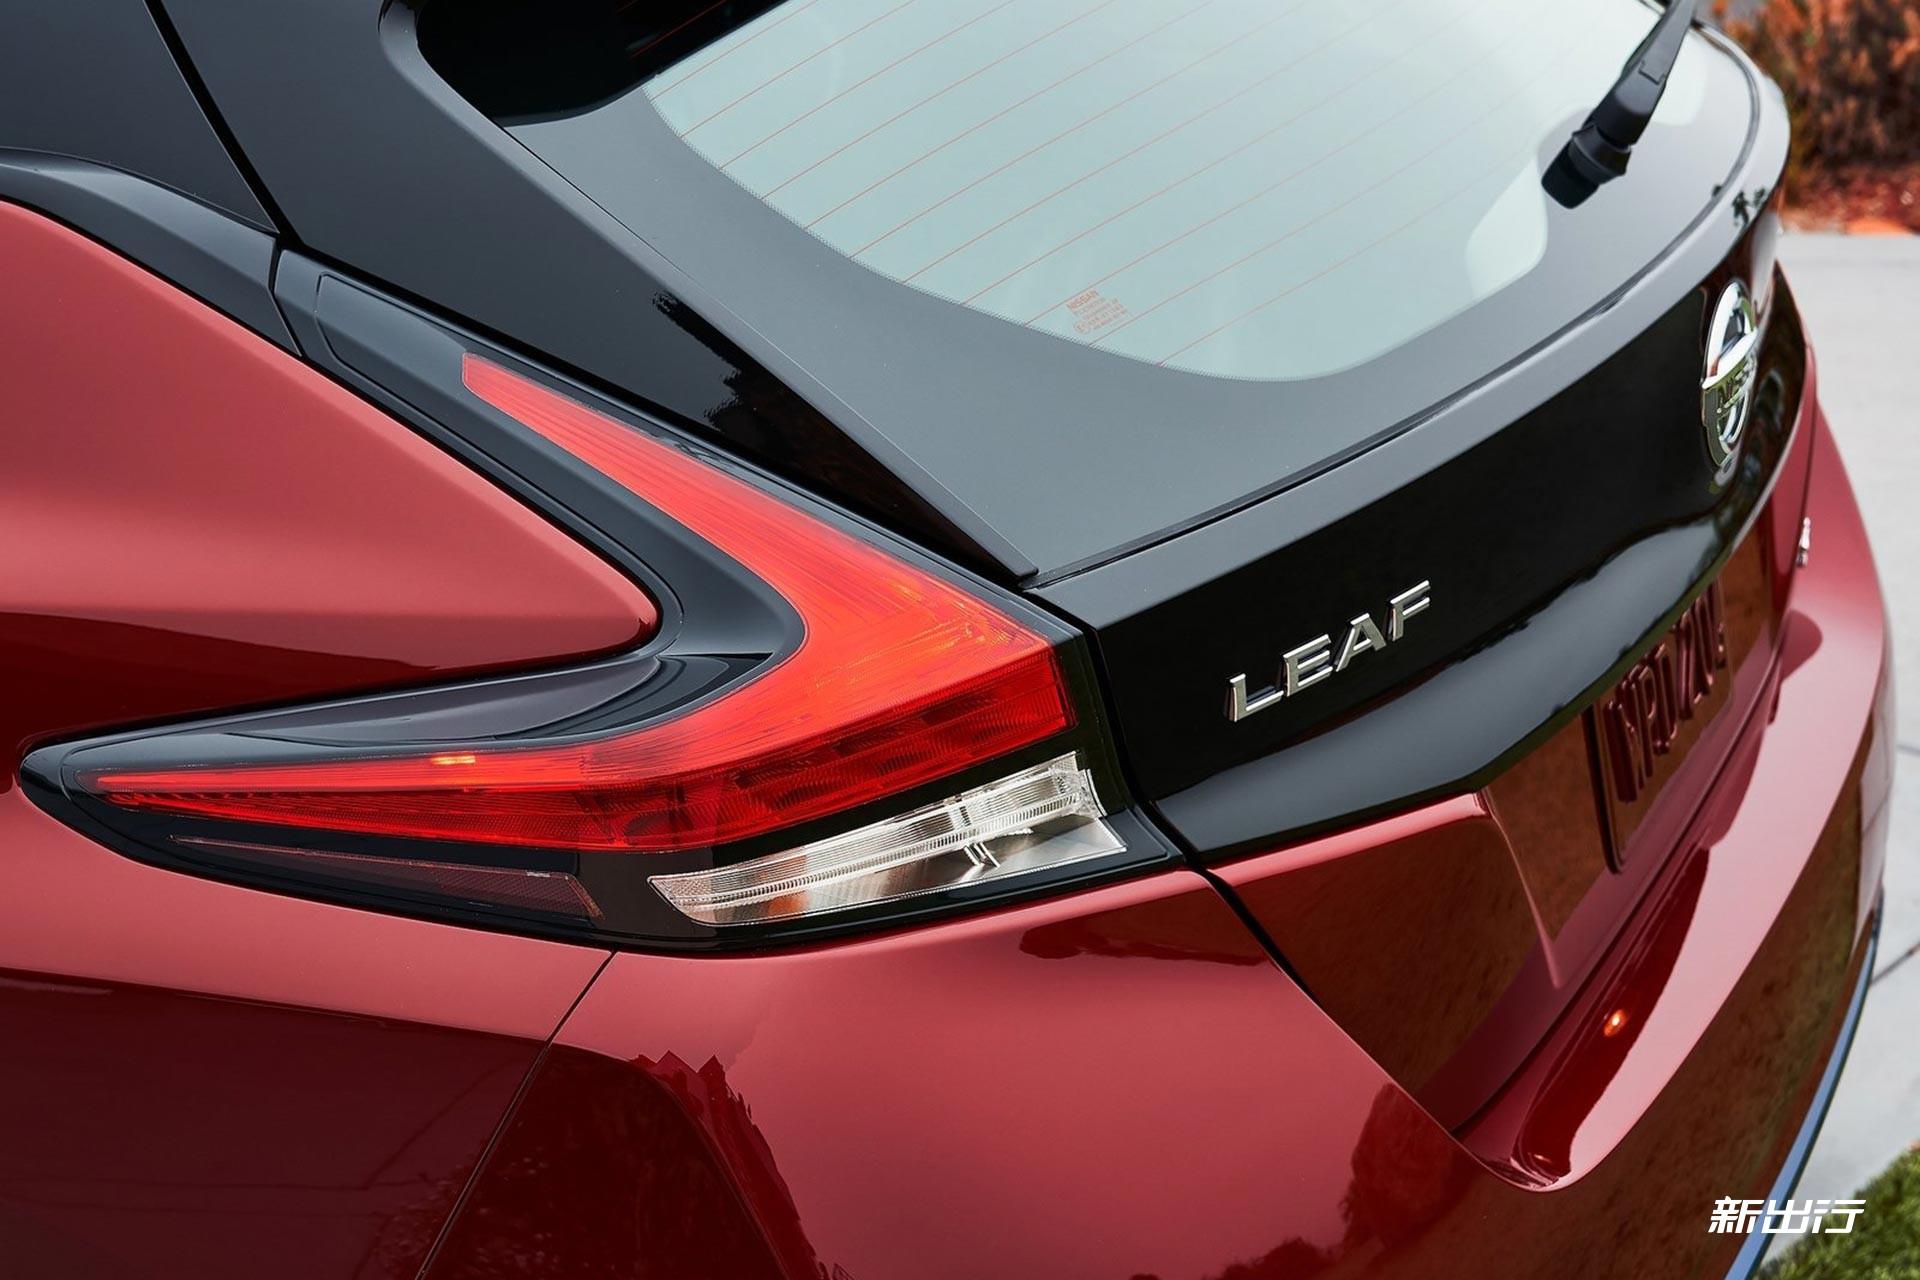 Nissan-Leaf-2018-1600-45.jpg